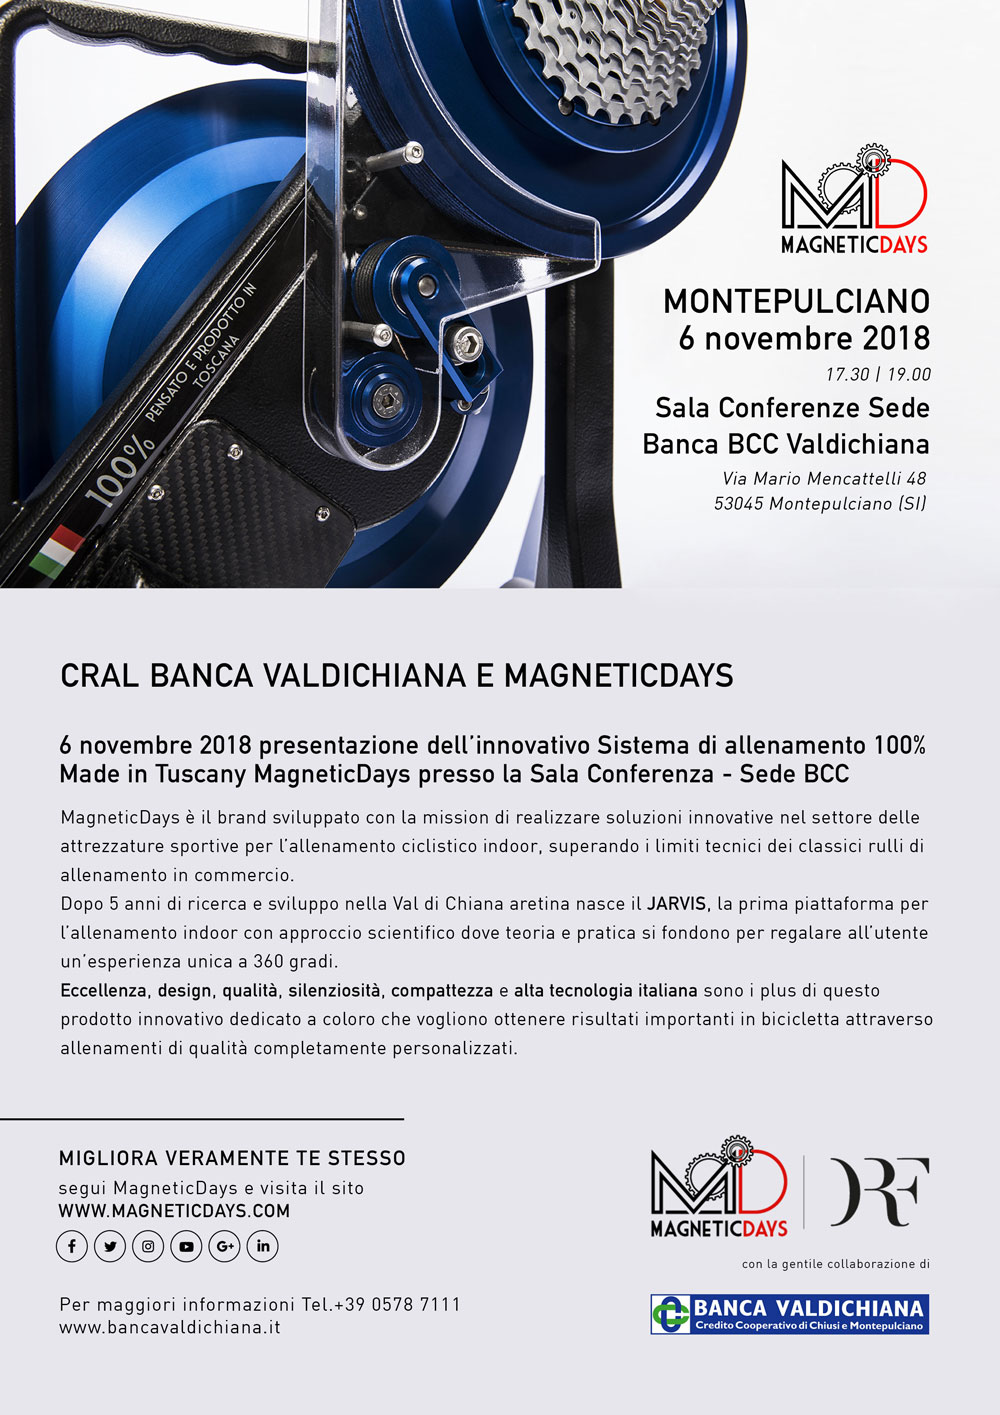 Cral Banca Valdichiana